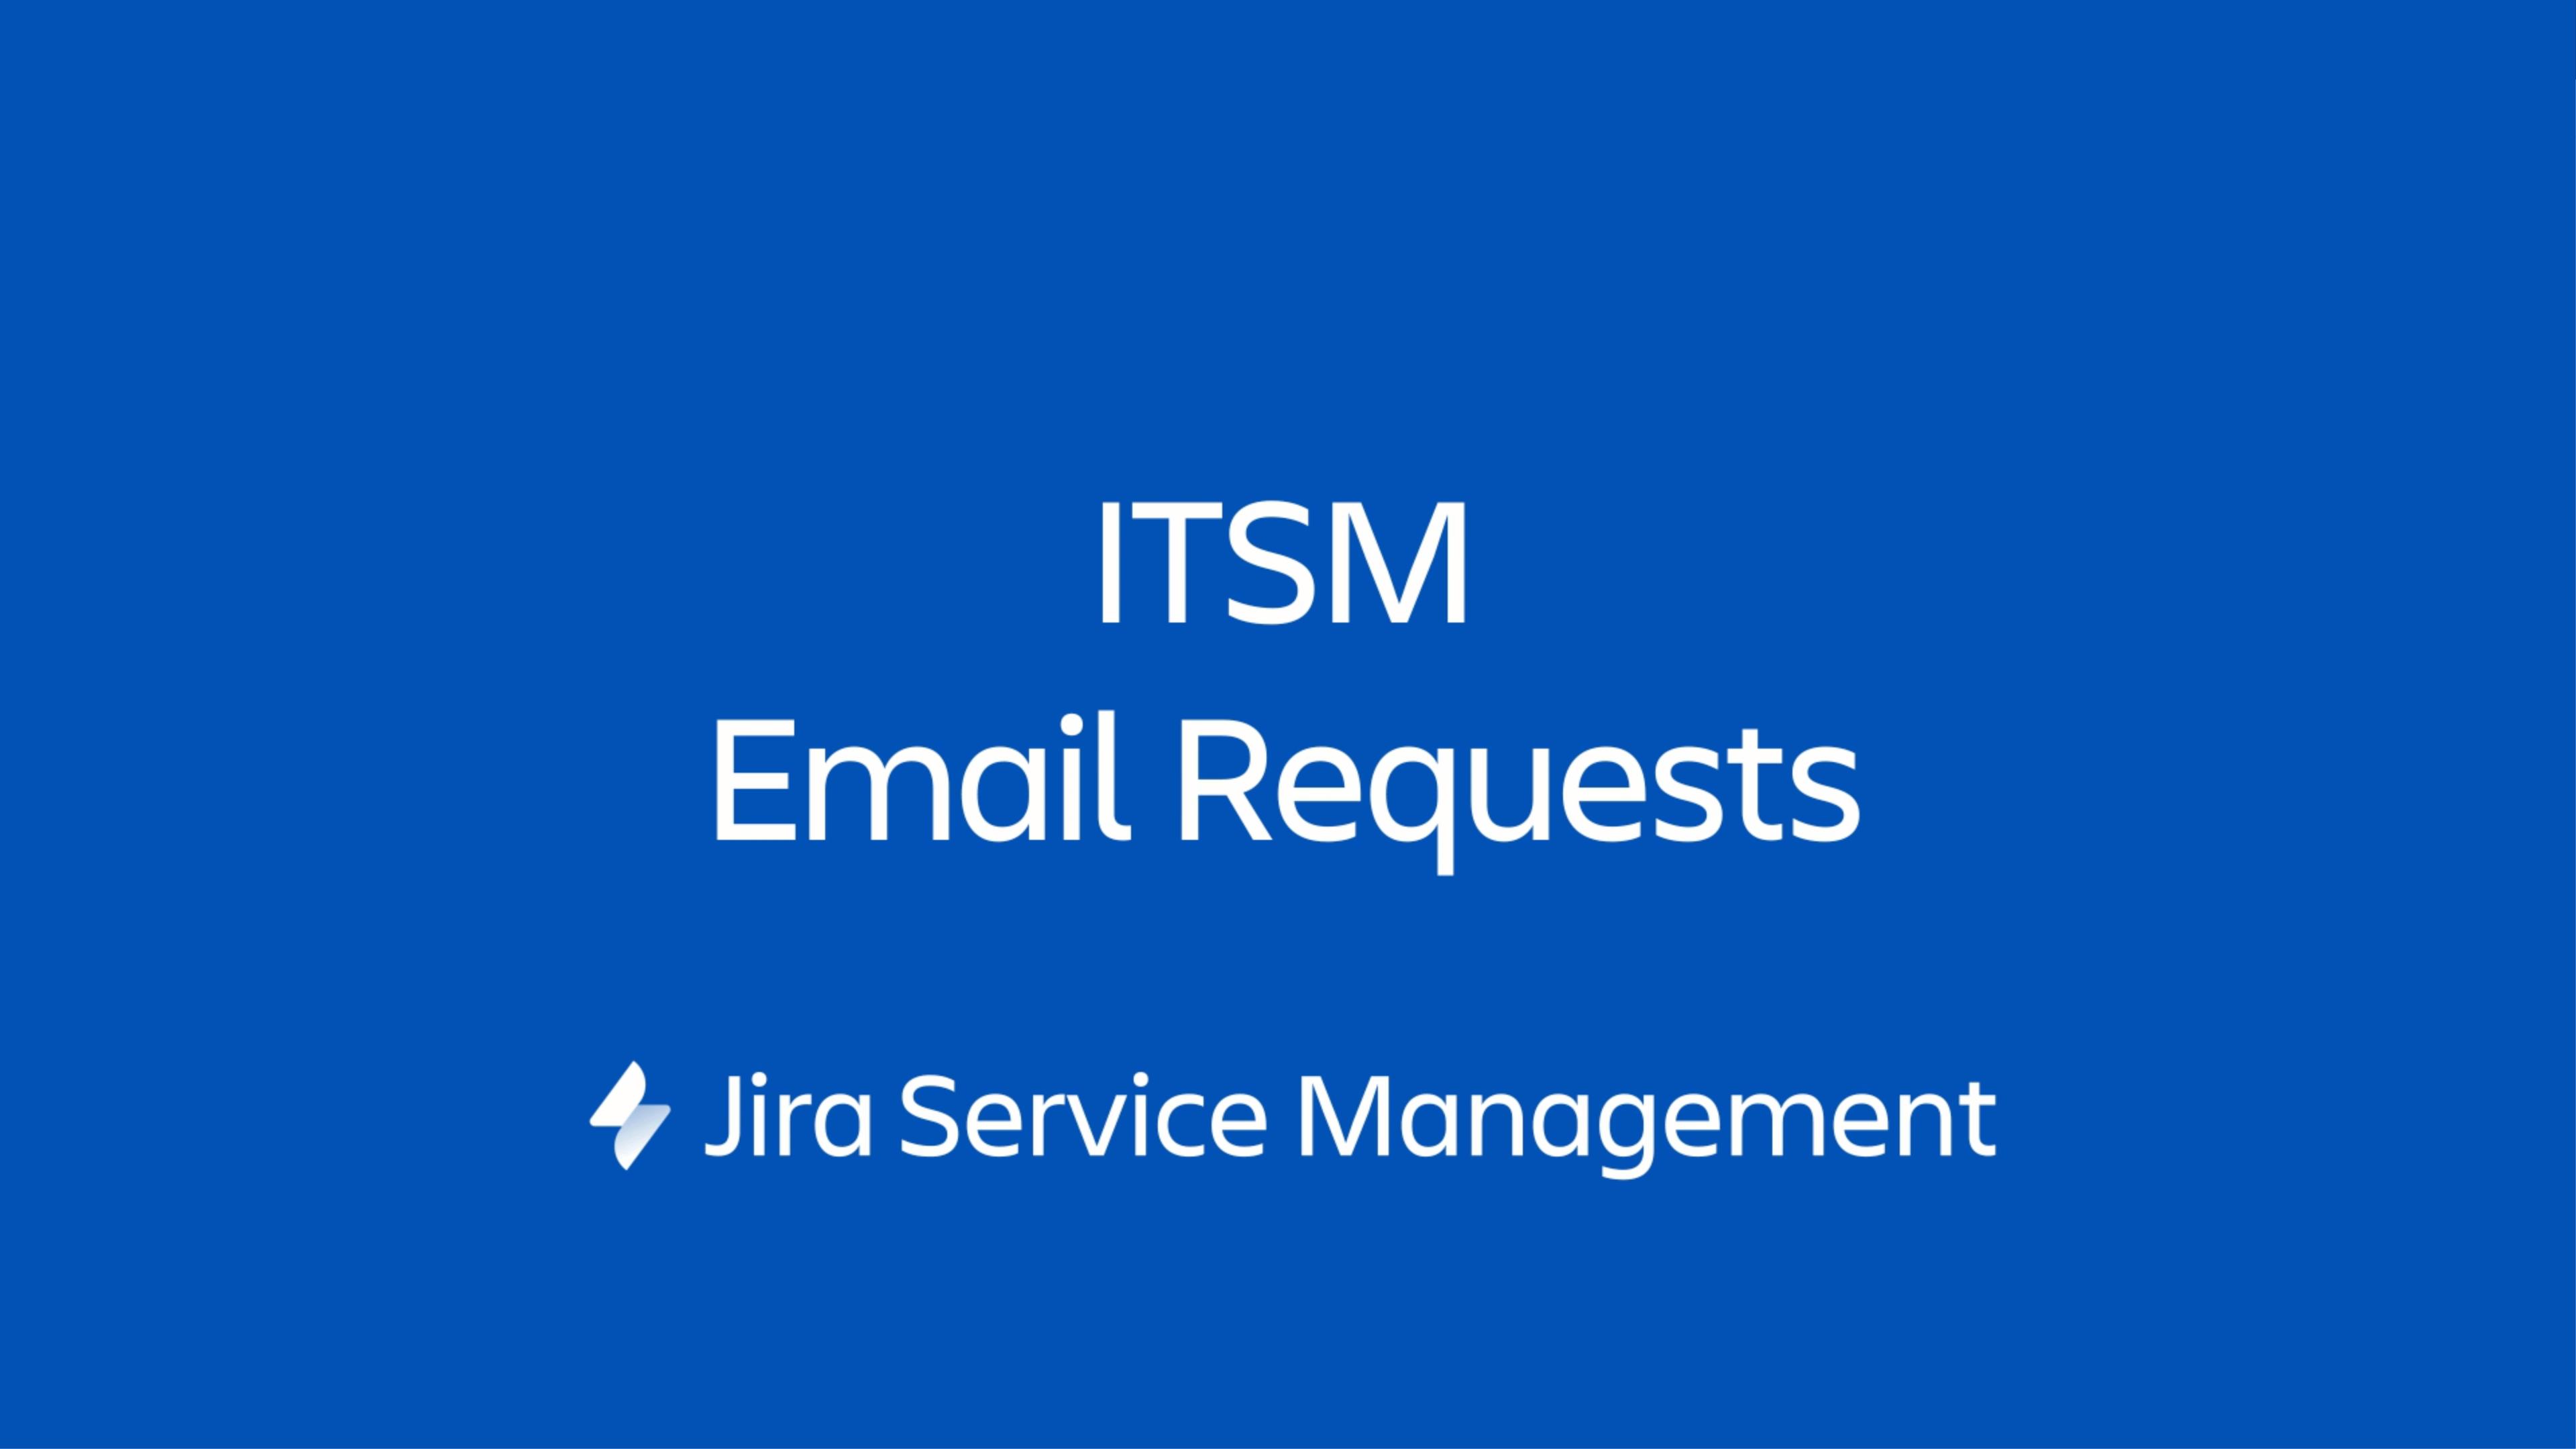 Jira Service Management での ITSM メール リクエスト